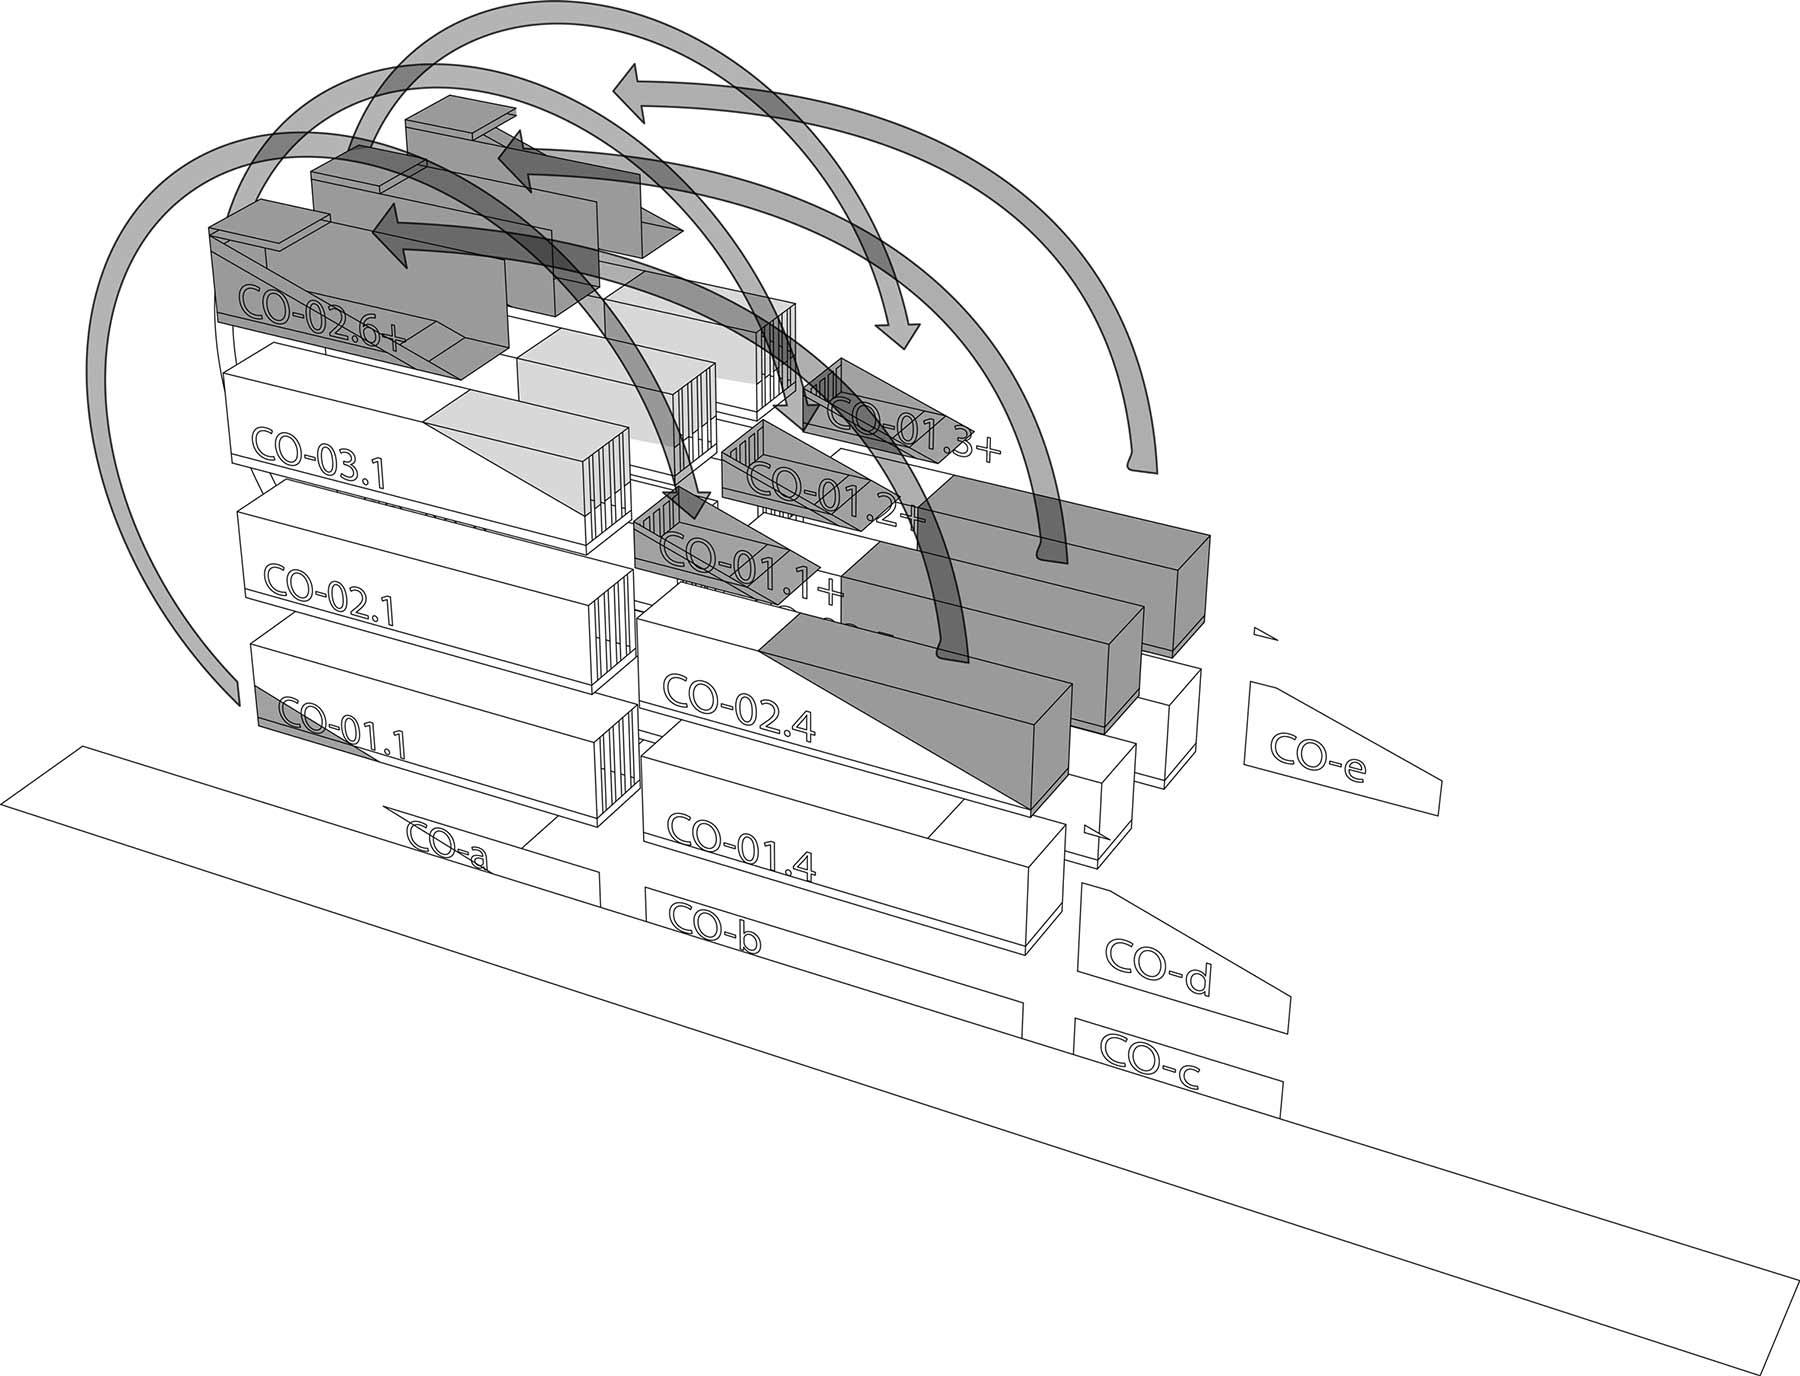 Haus aus 21 verschnittenen Containern carroll-house-21-Container_11